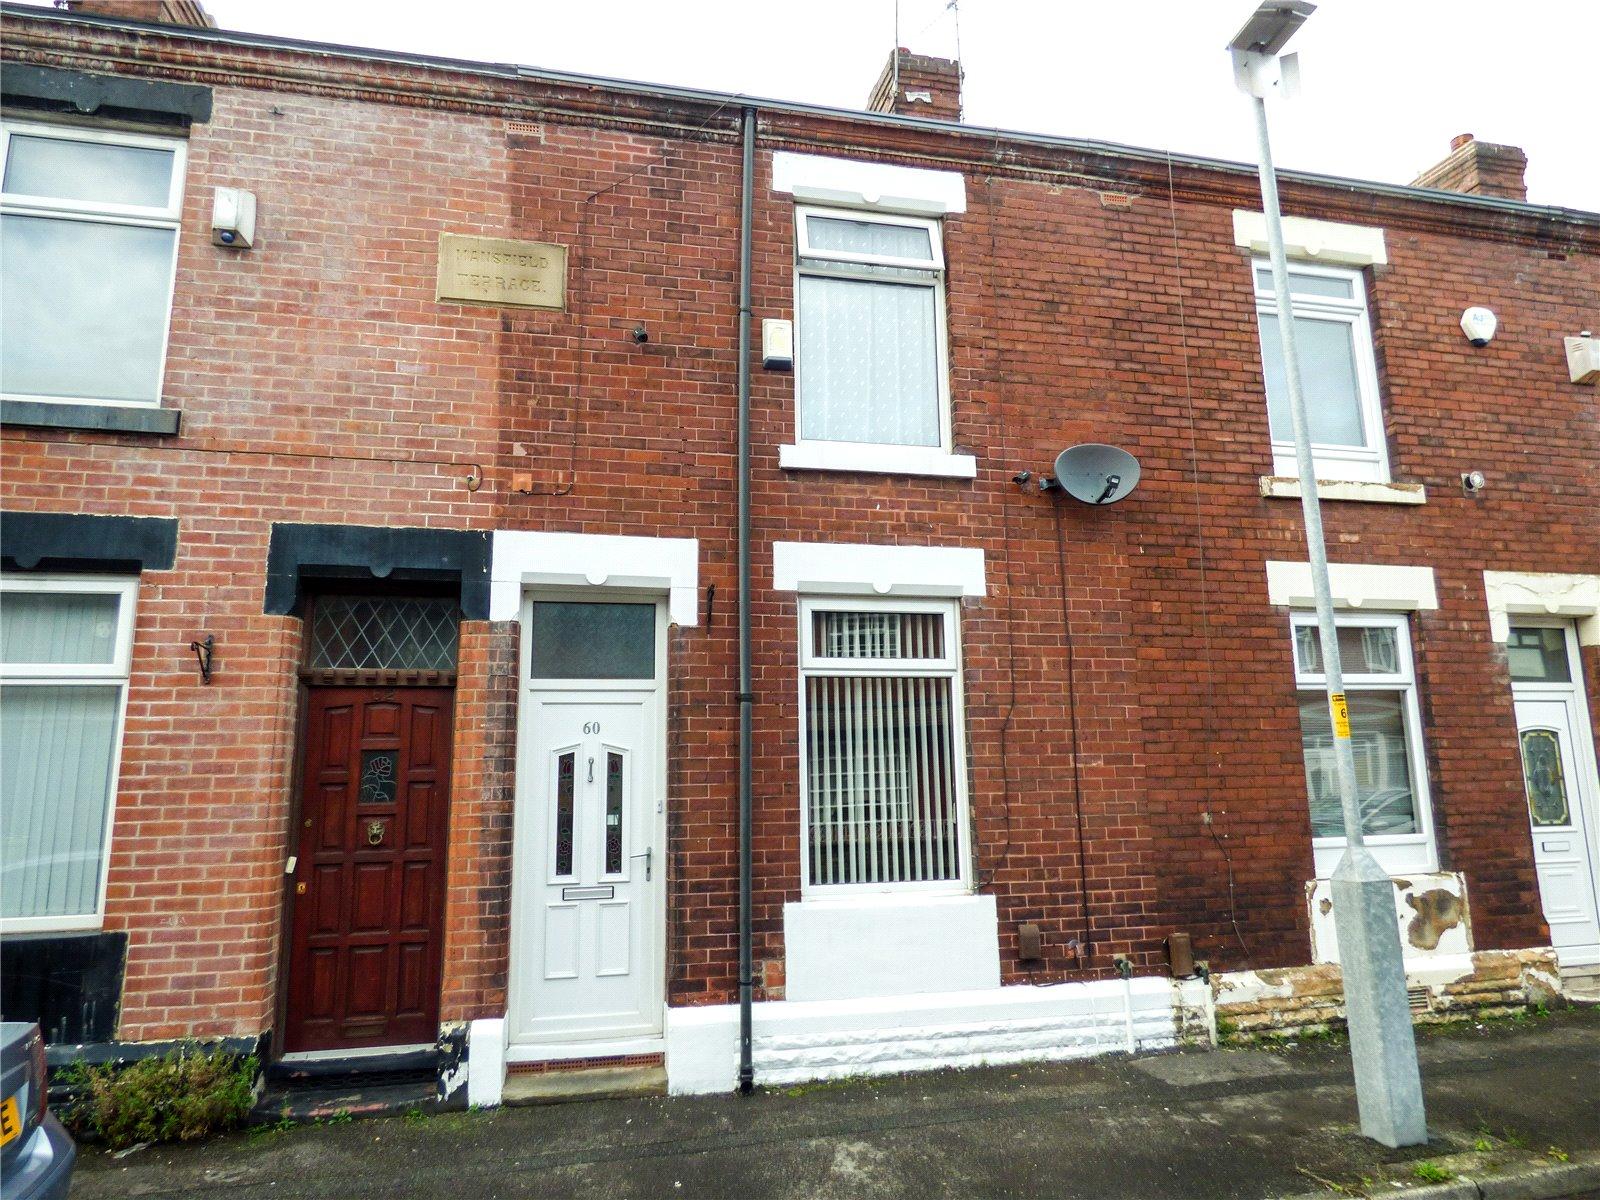 2 Bedrooms Terraced House for sale in Mansfield Street, Ashton-under-Lyne, Greater Manchester, OL7